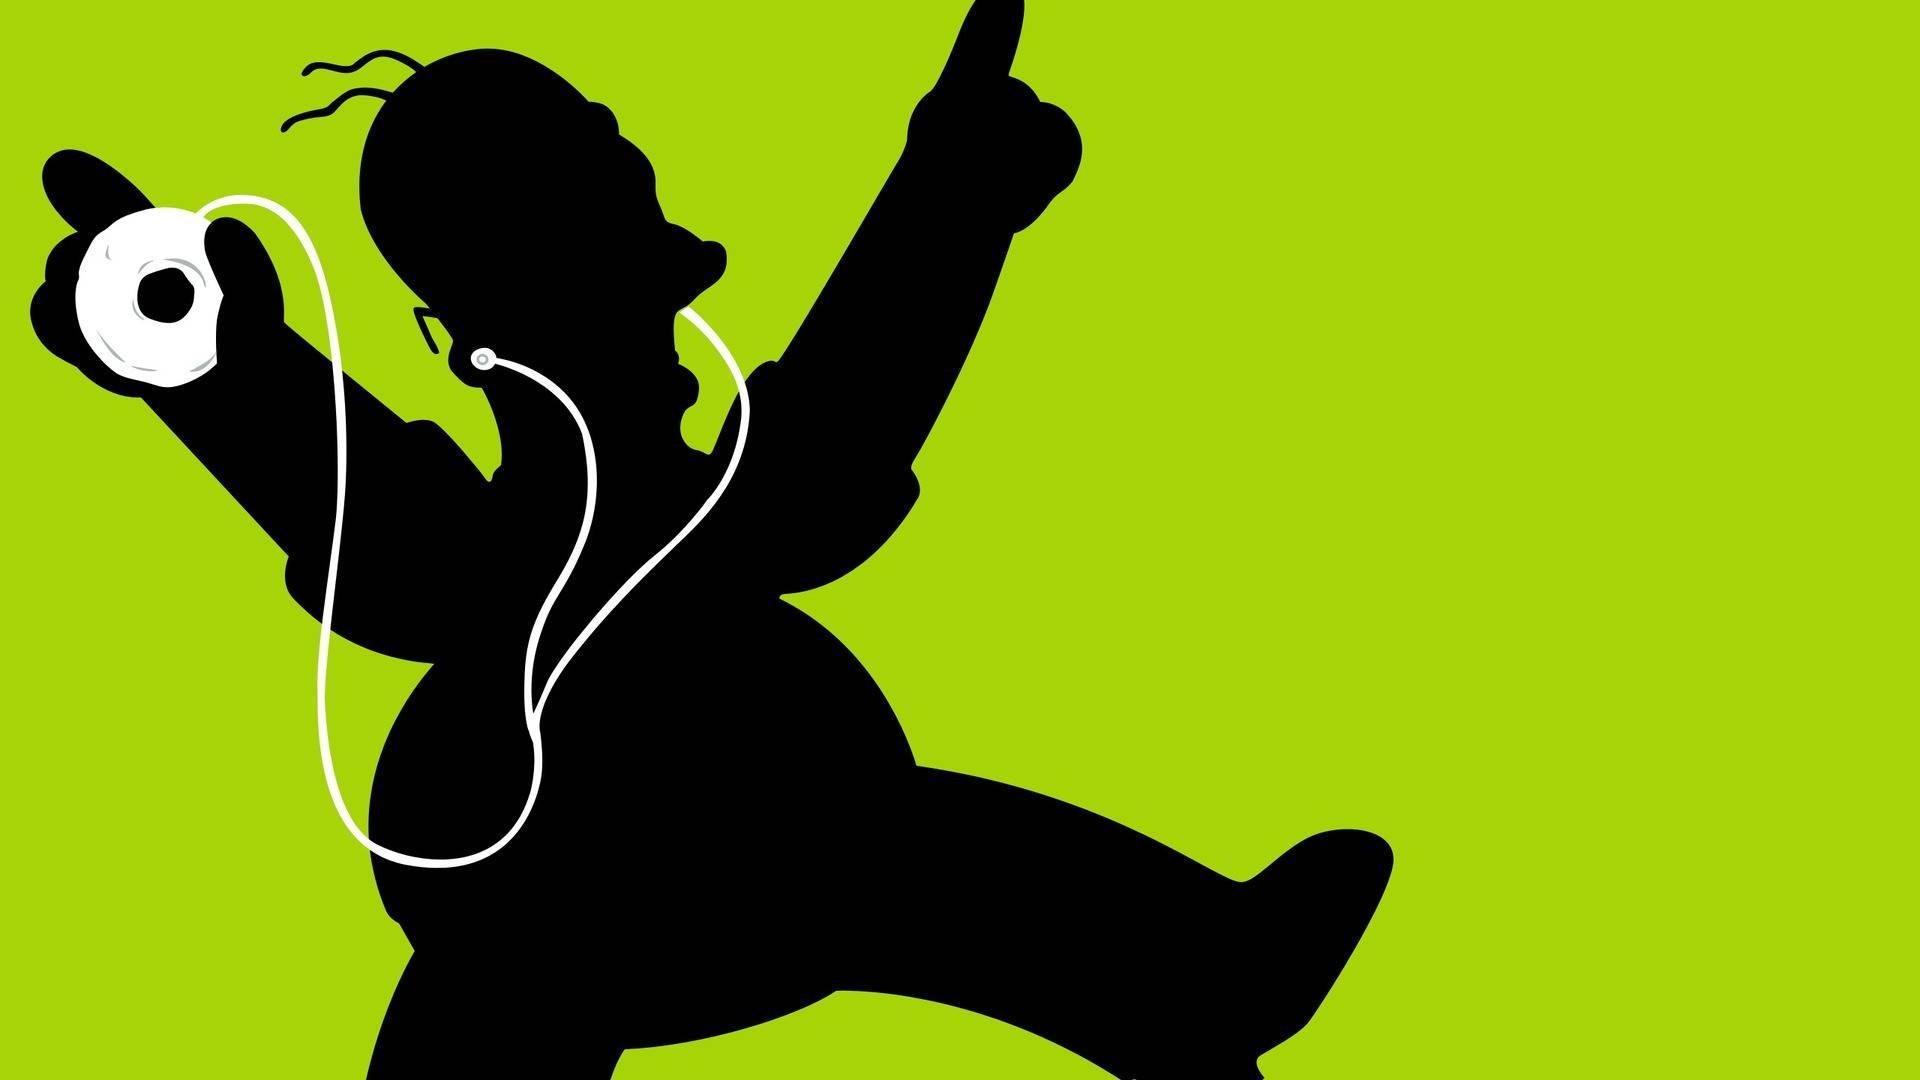 Free Download Music Ipod 19201080 Wallpaper 1704335 1920x1080